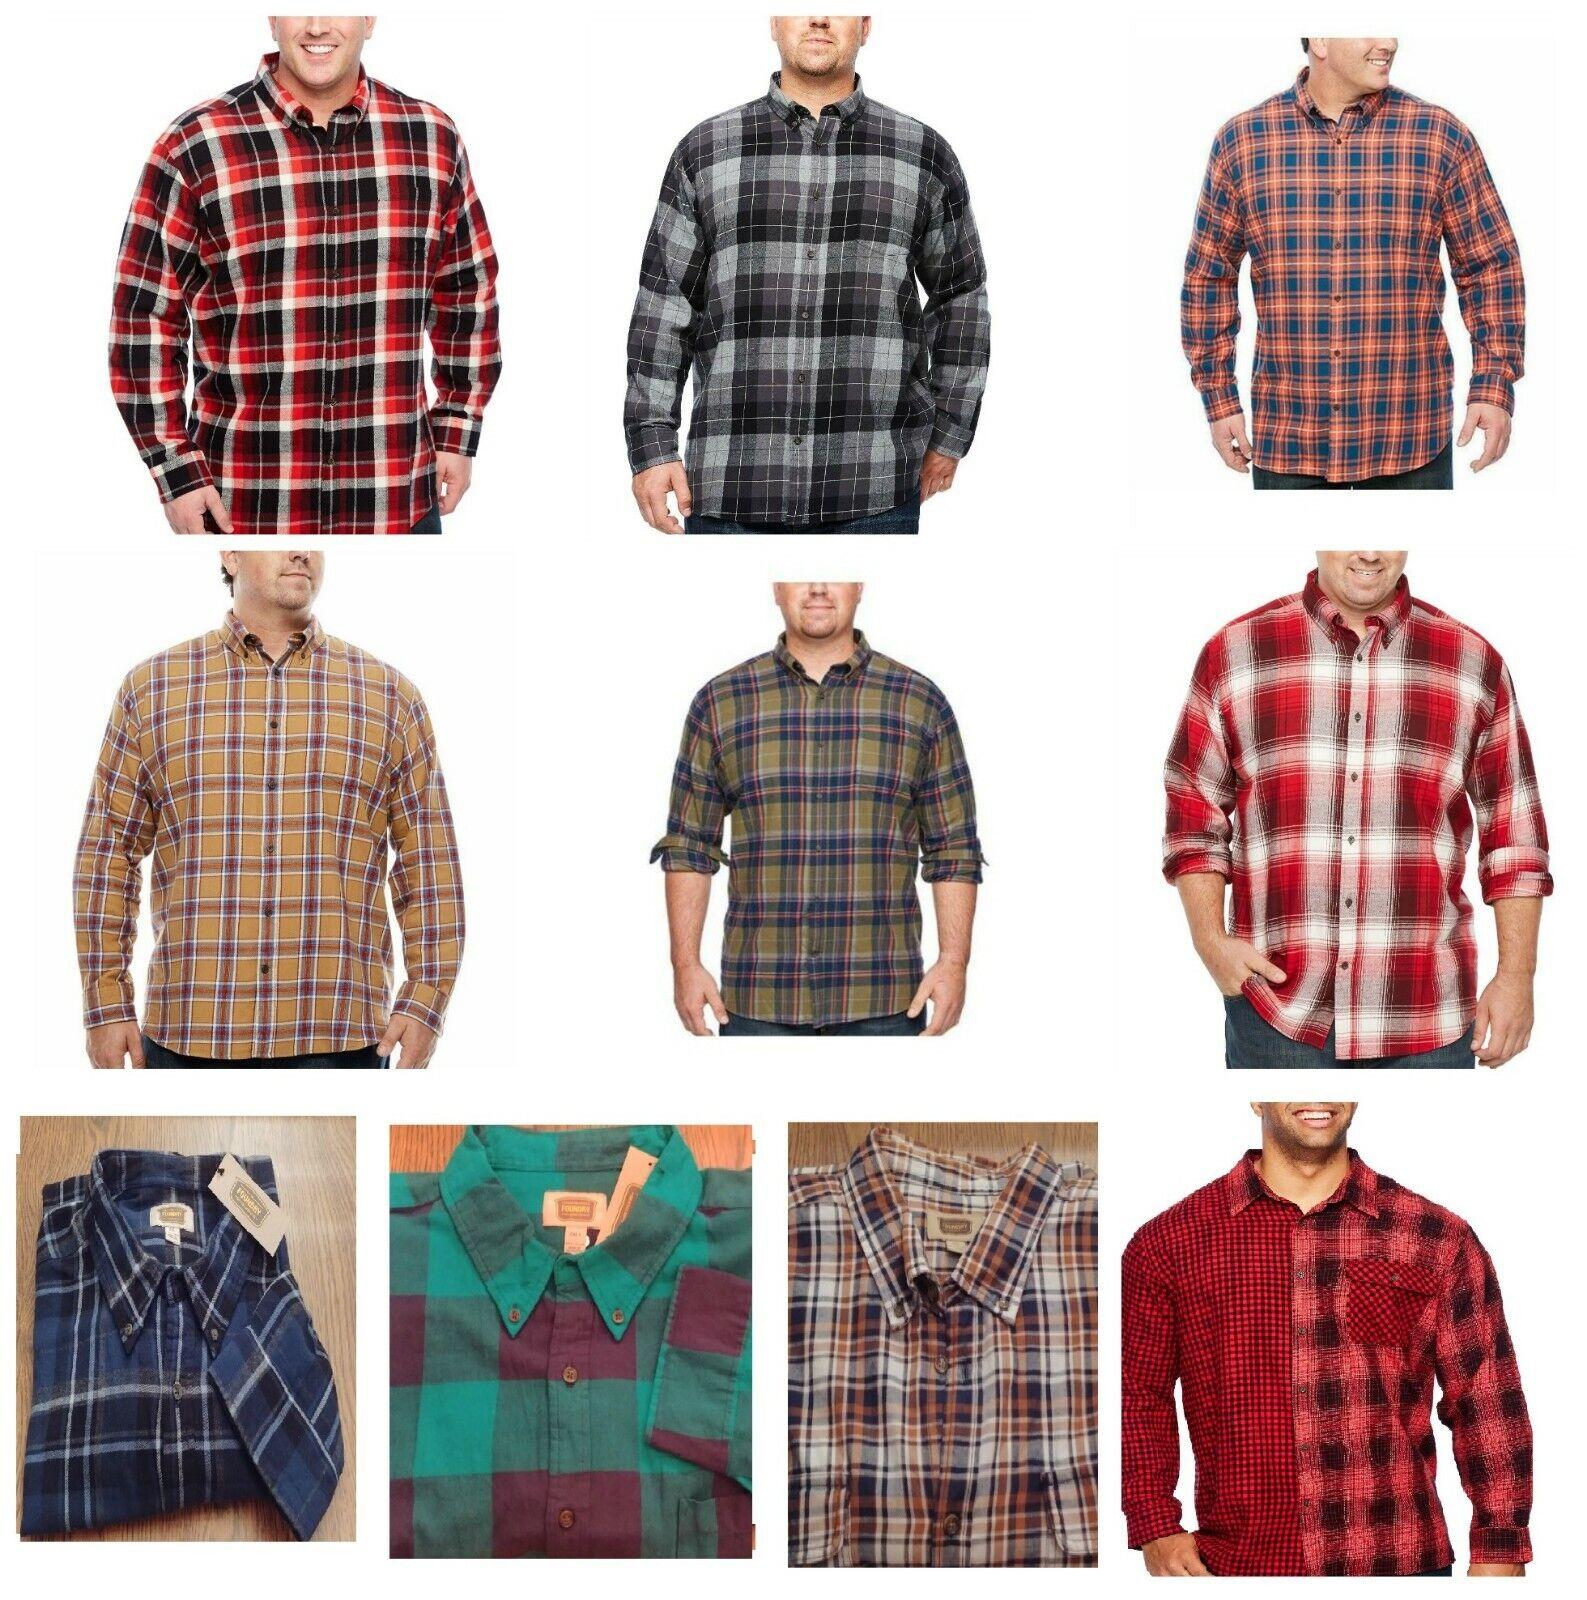 Foundry Men's Shirt LS Plaid Flannel XLT, 2XL, 2XLT, 3XL 3XL